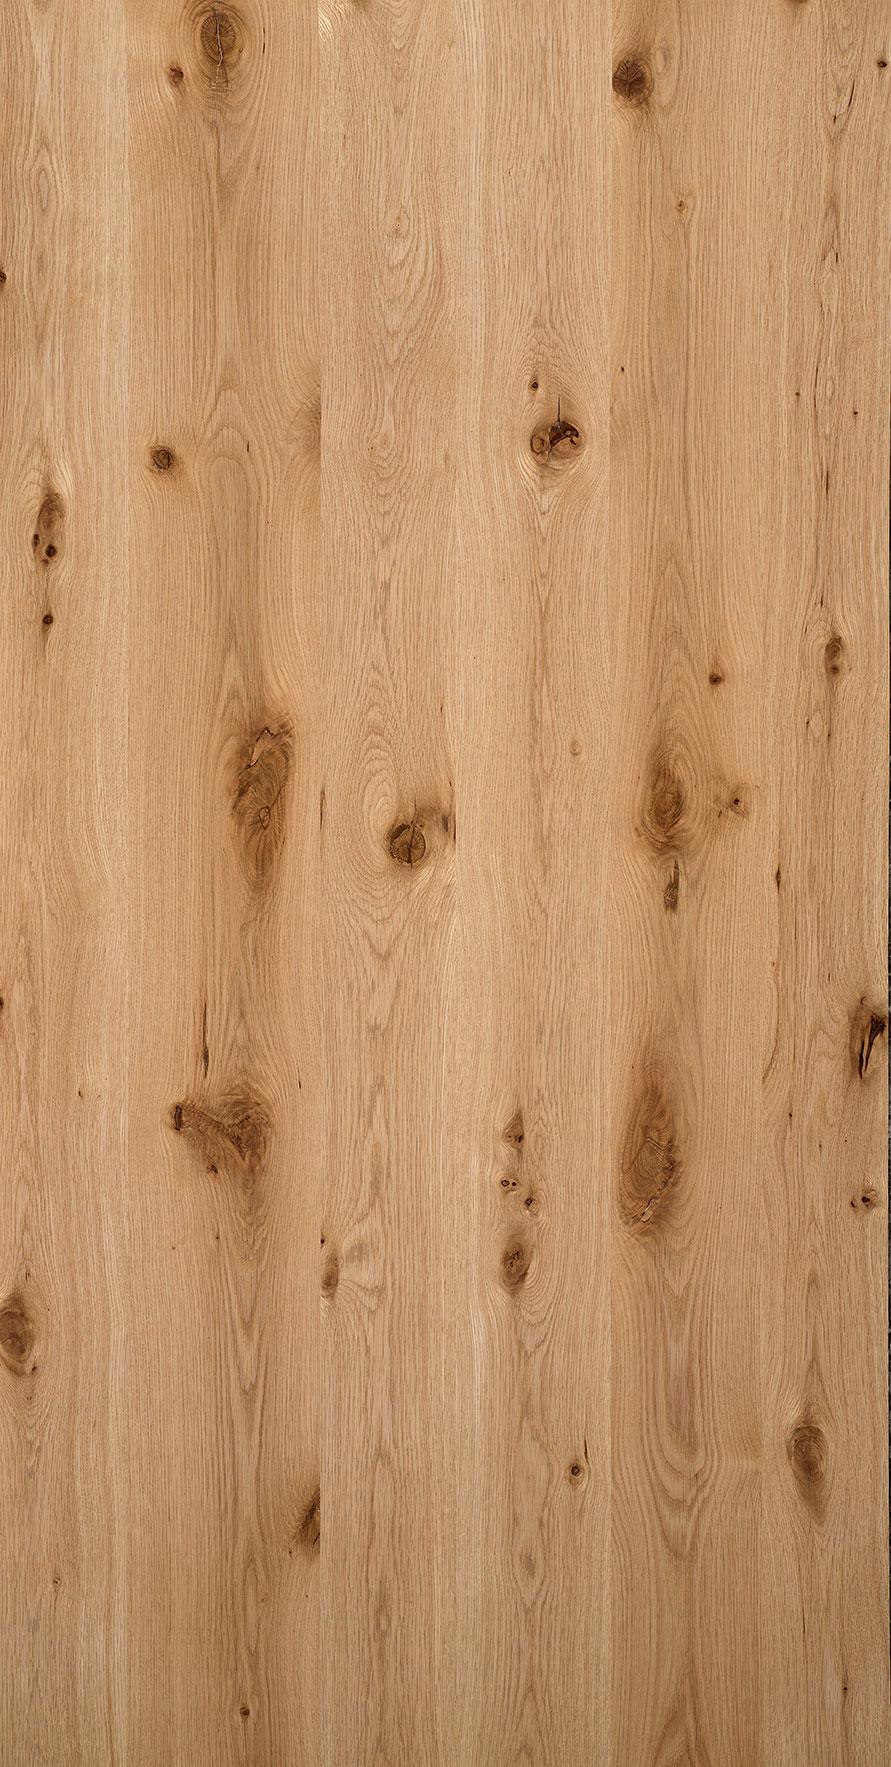 Oak-Random-Knotty